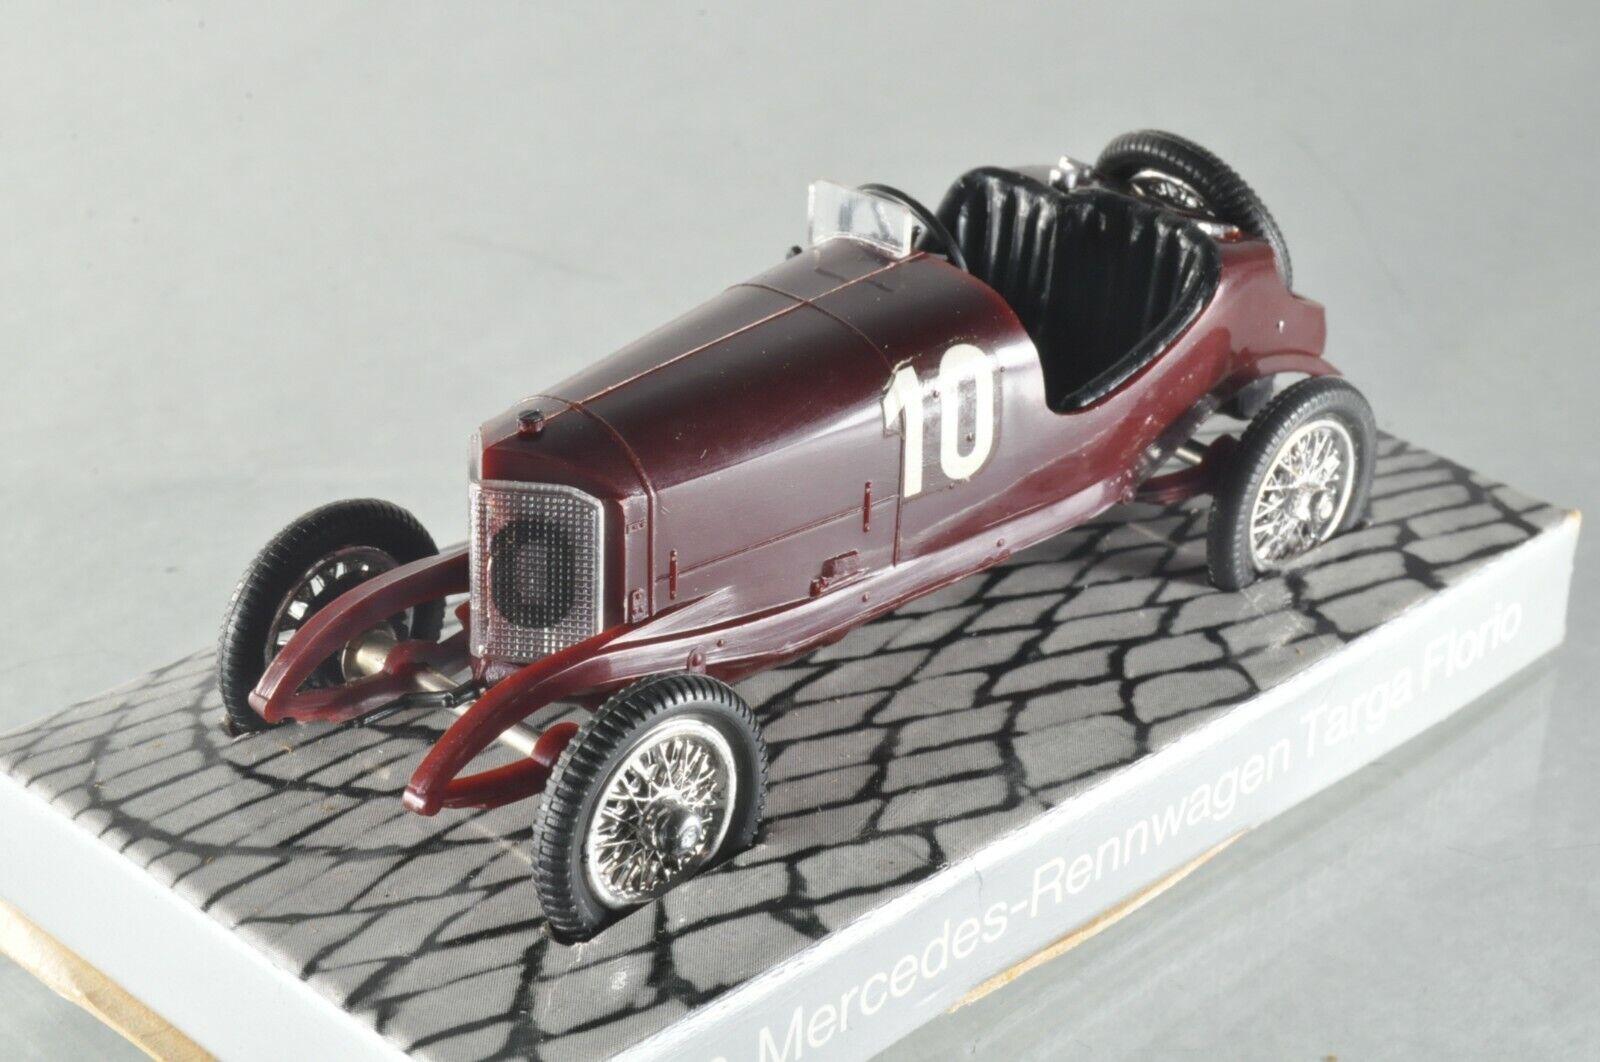 JS059 Cursor Modell #1072 1:43 1923 Mercedes Rennwagen Targa Florio A+/b